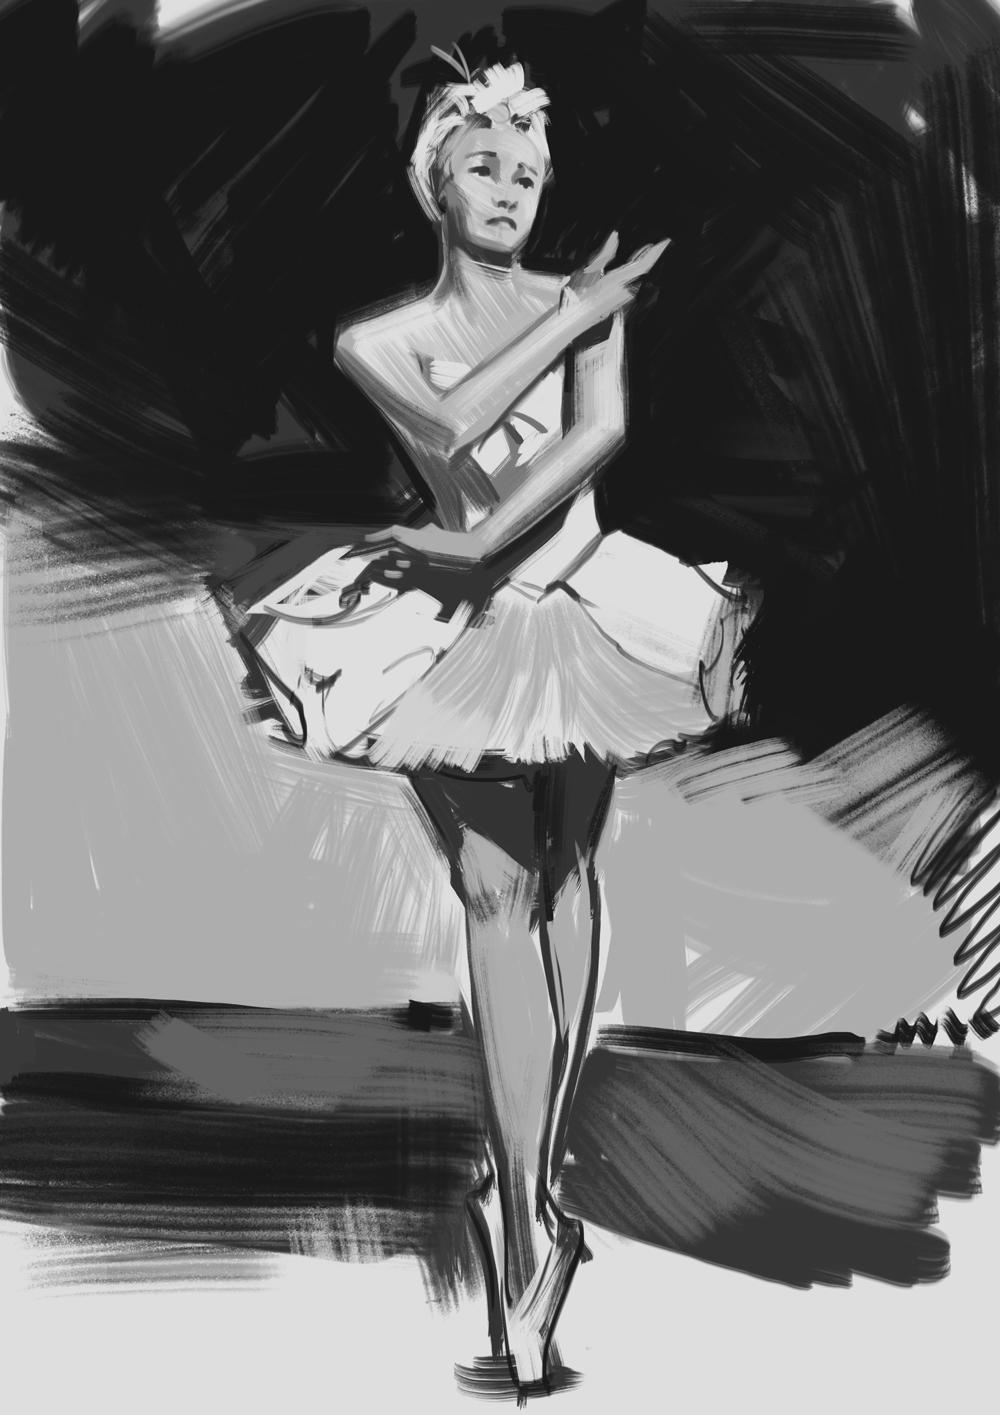 balerin sketch